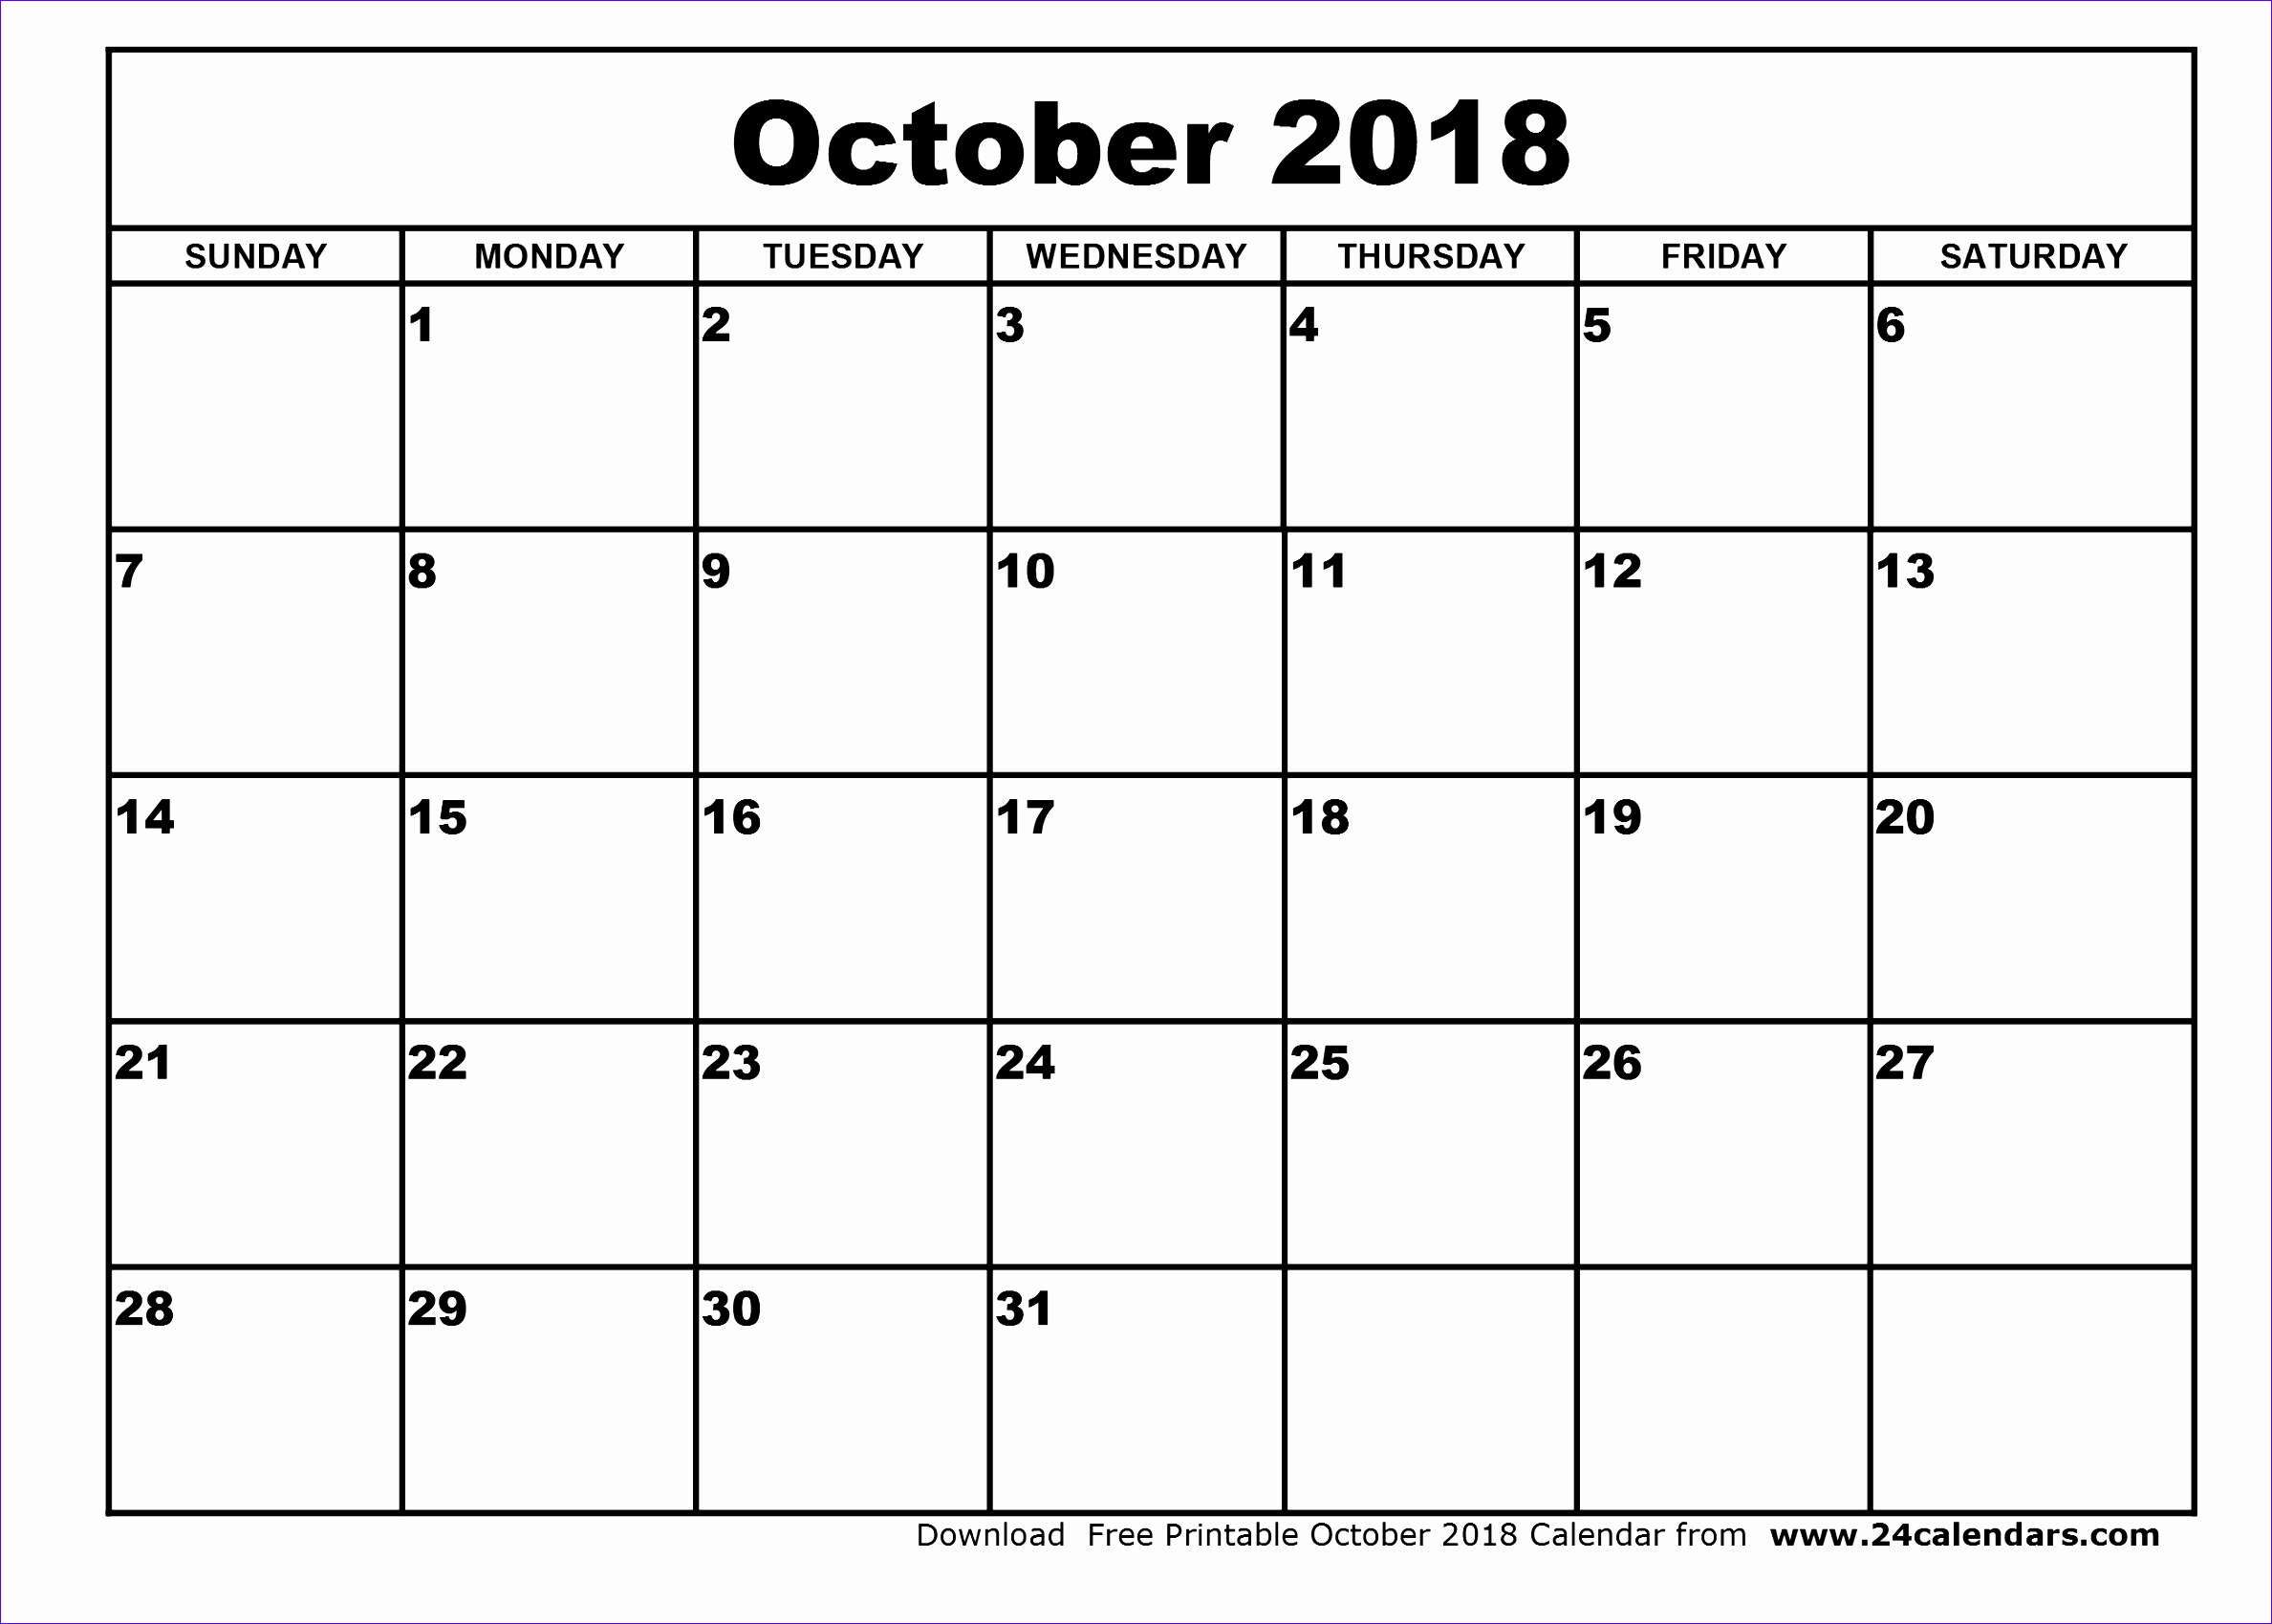 october 2018 calendar 973 23771699